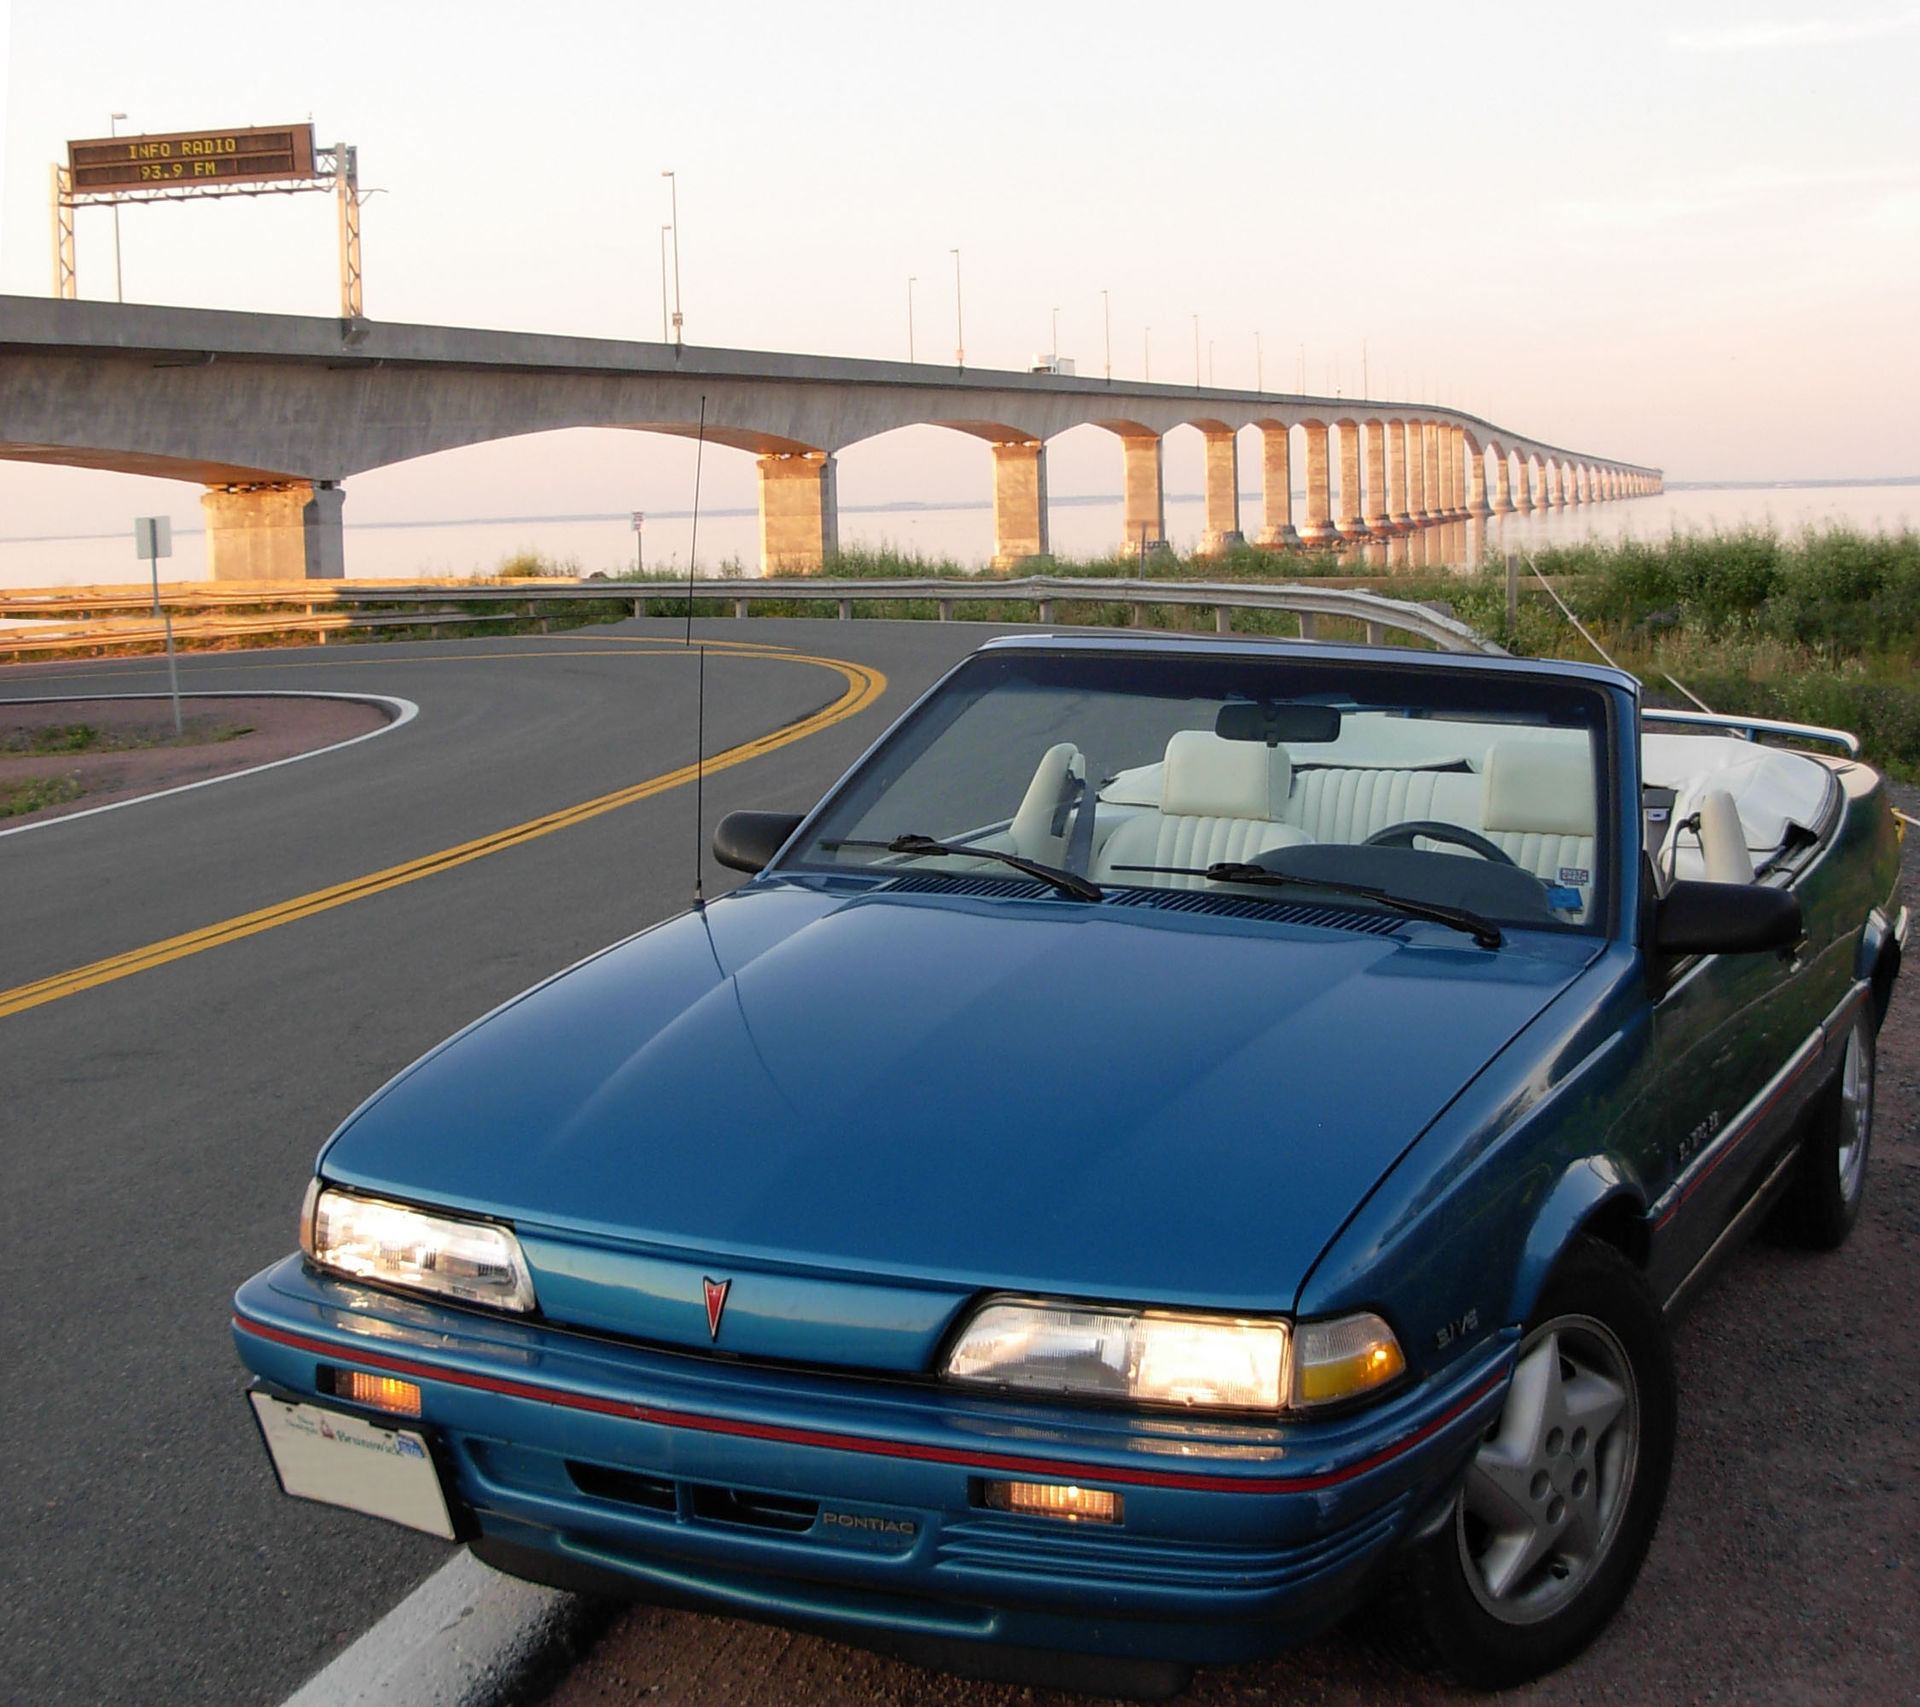 Px Pontiac Sunbird Convertible At Confederation Bridge